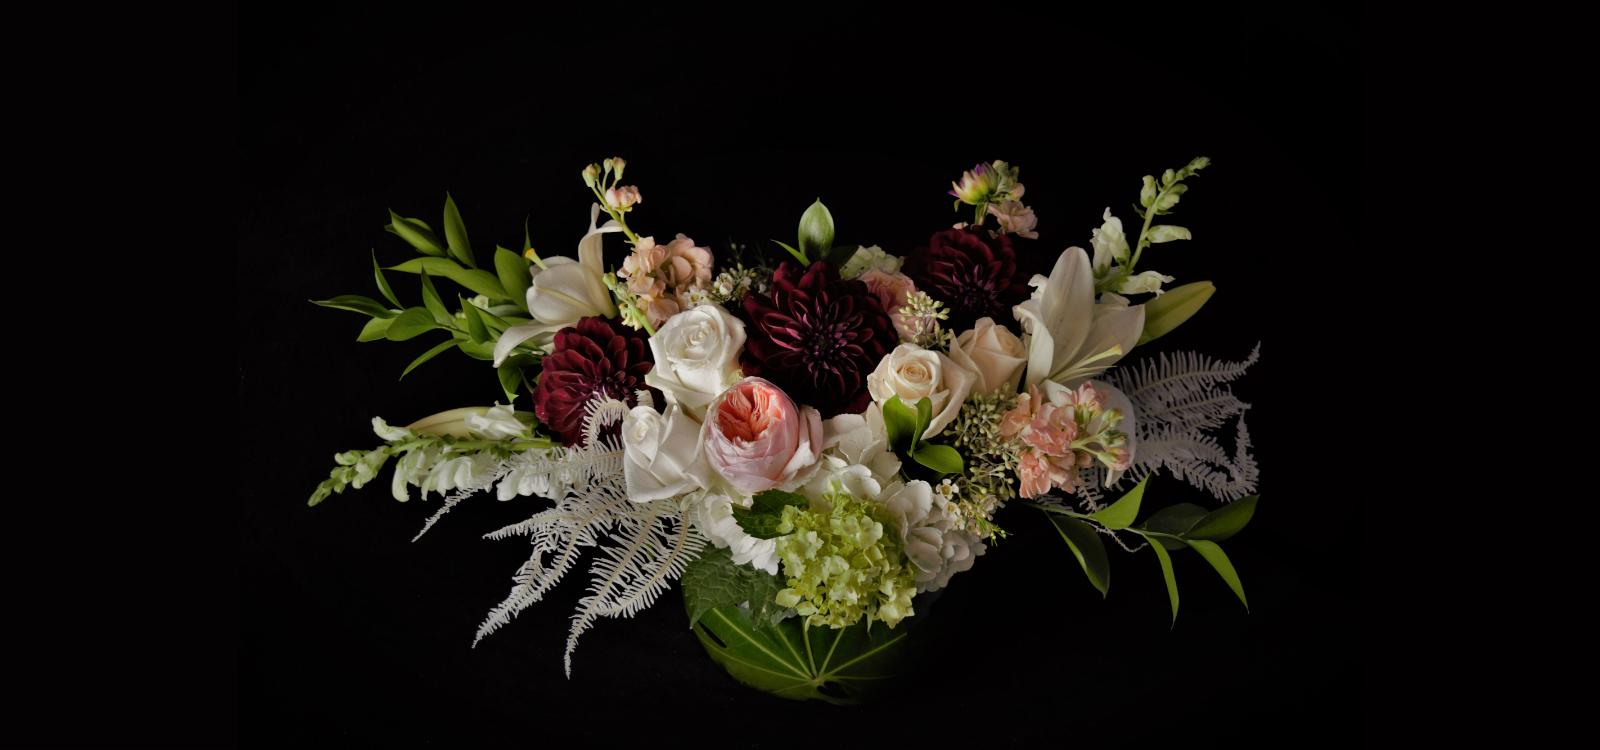 Kelilabee Flower Company Top Charlotte Waxhaw Florist Located In